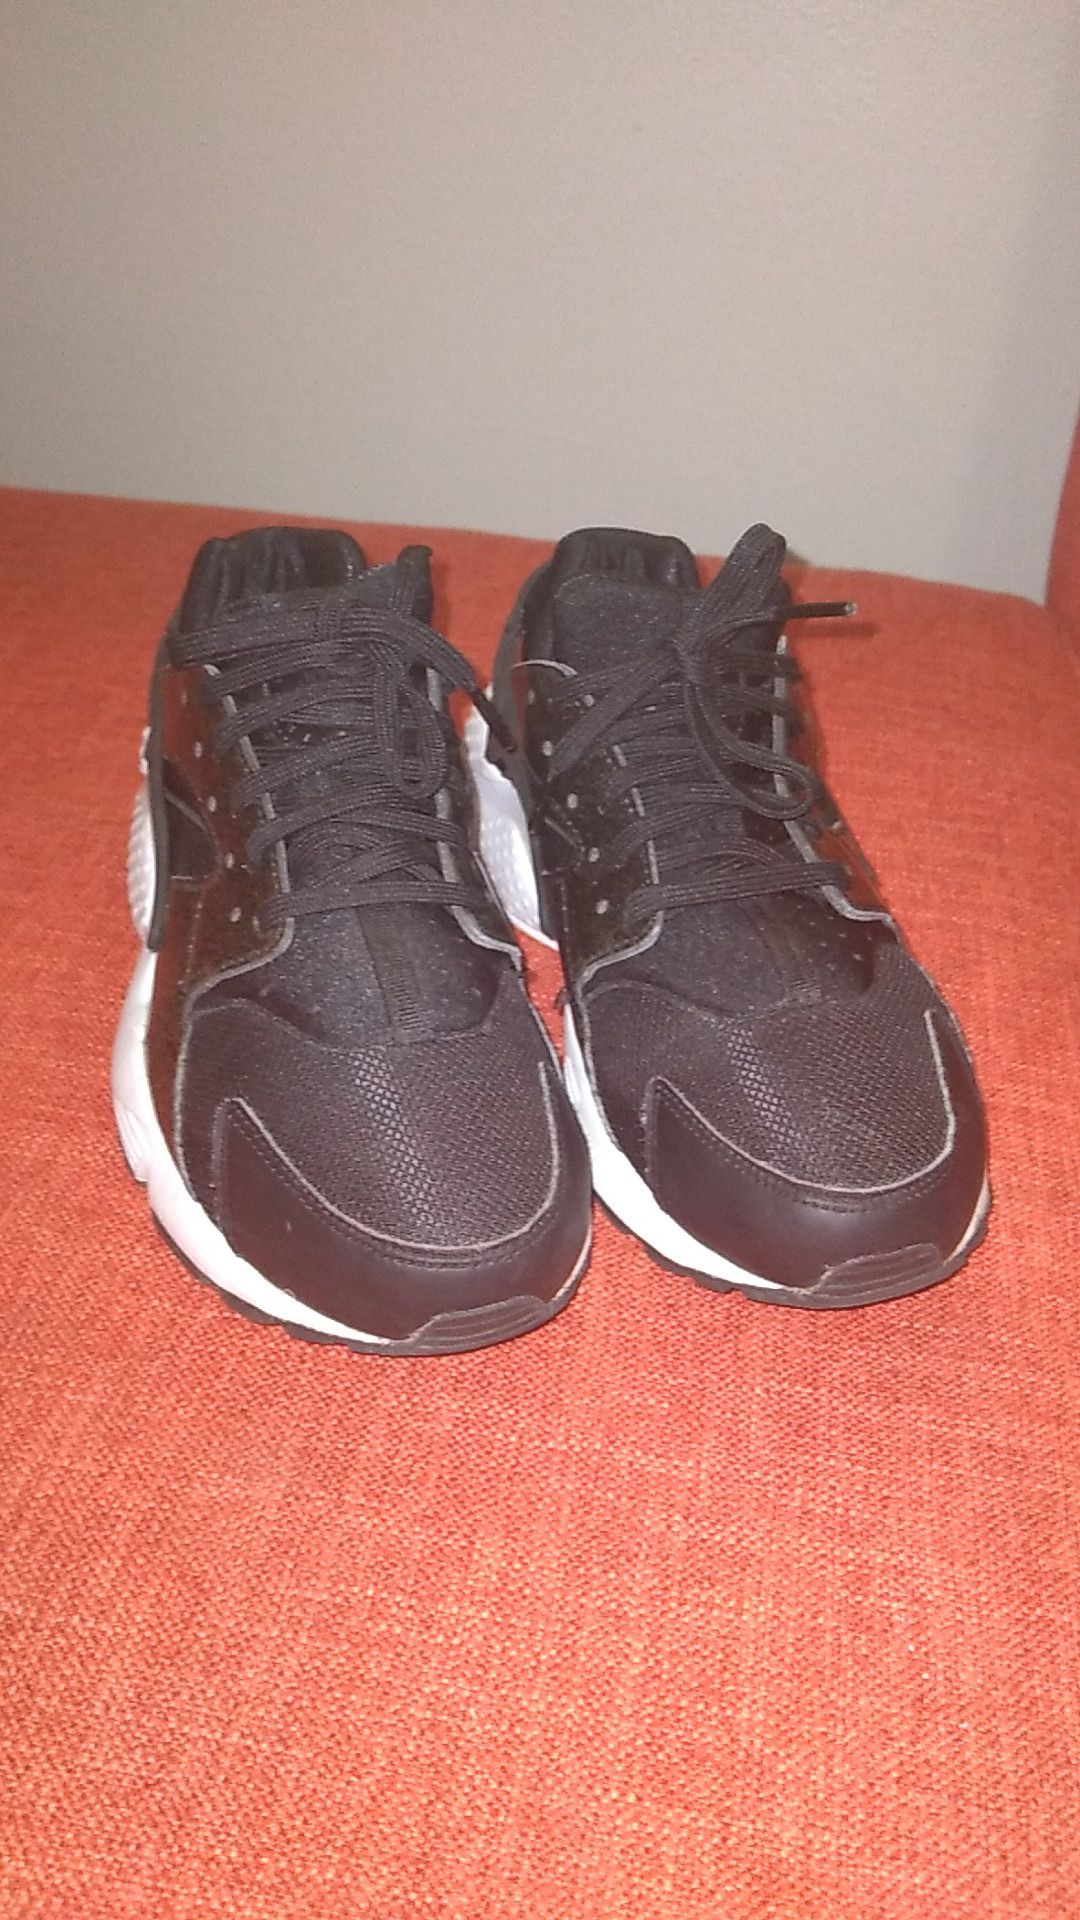 Nike 6.5 youth